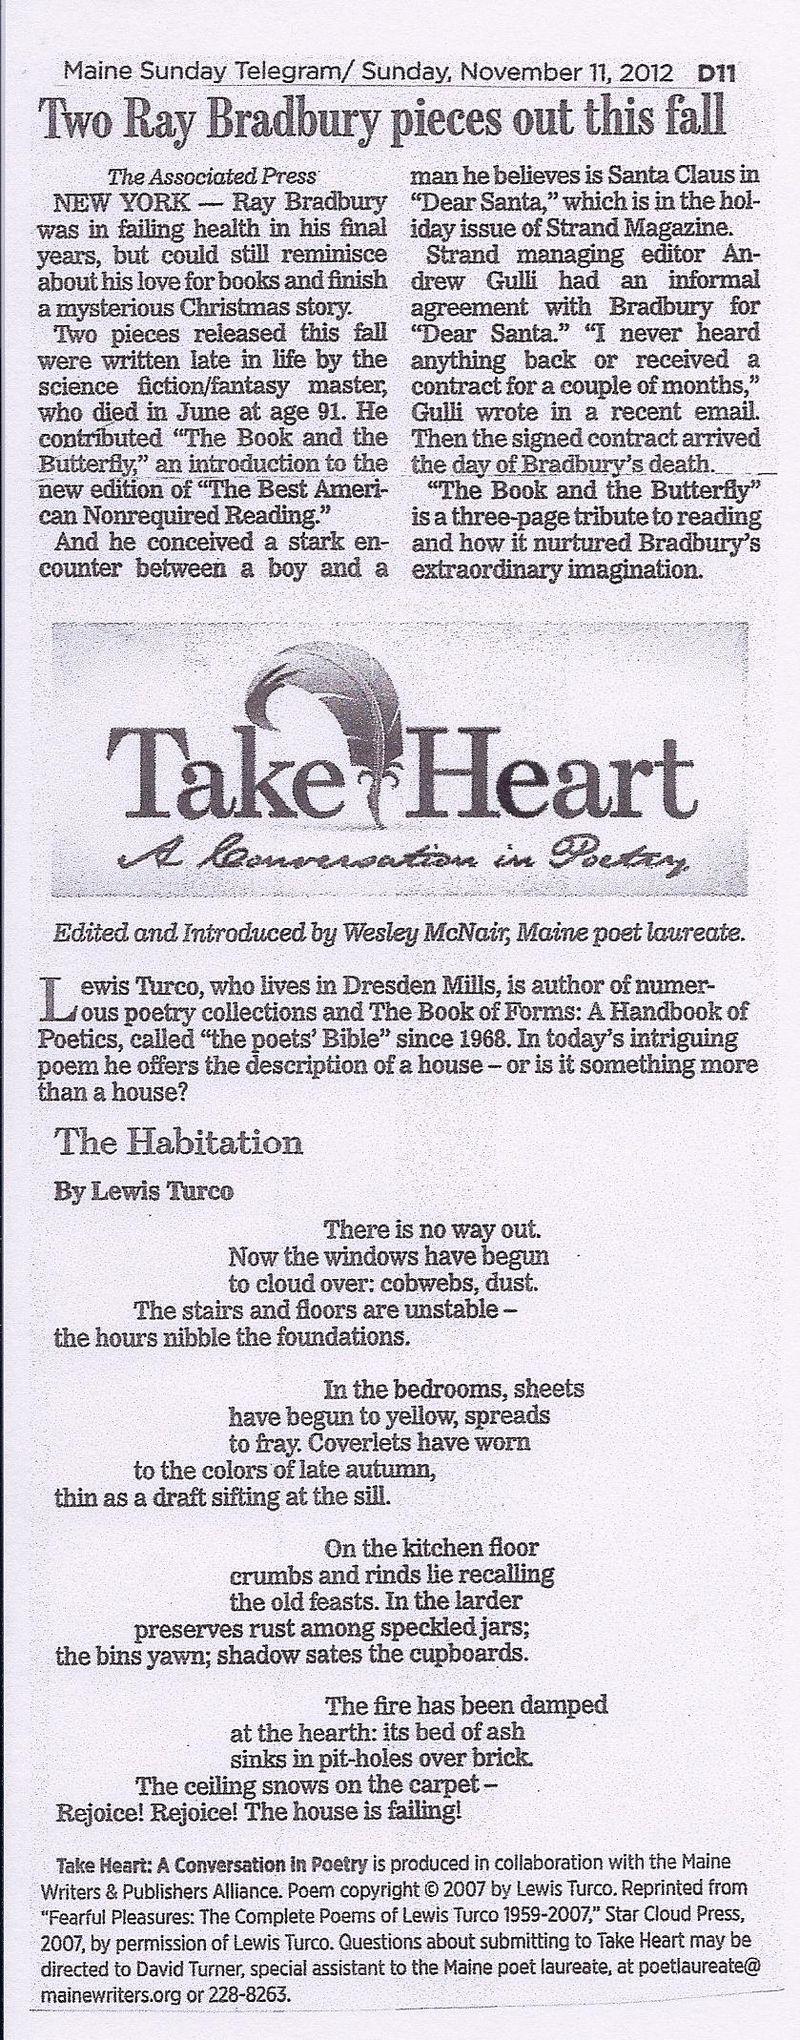 The Habitation